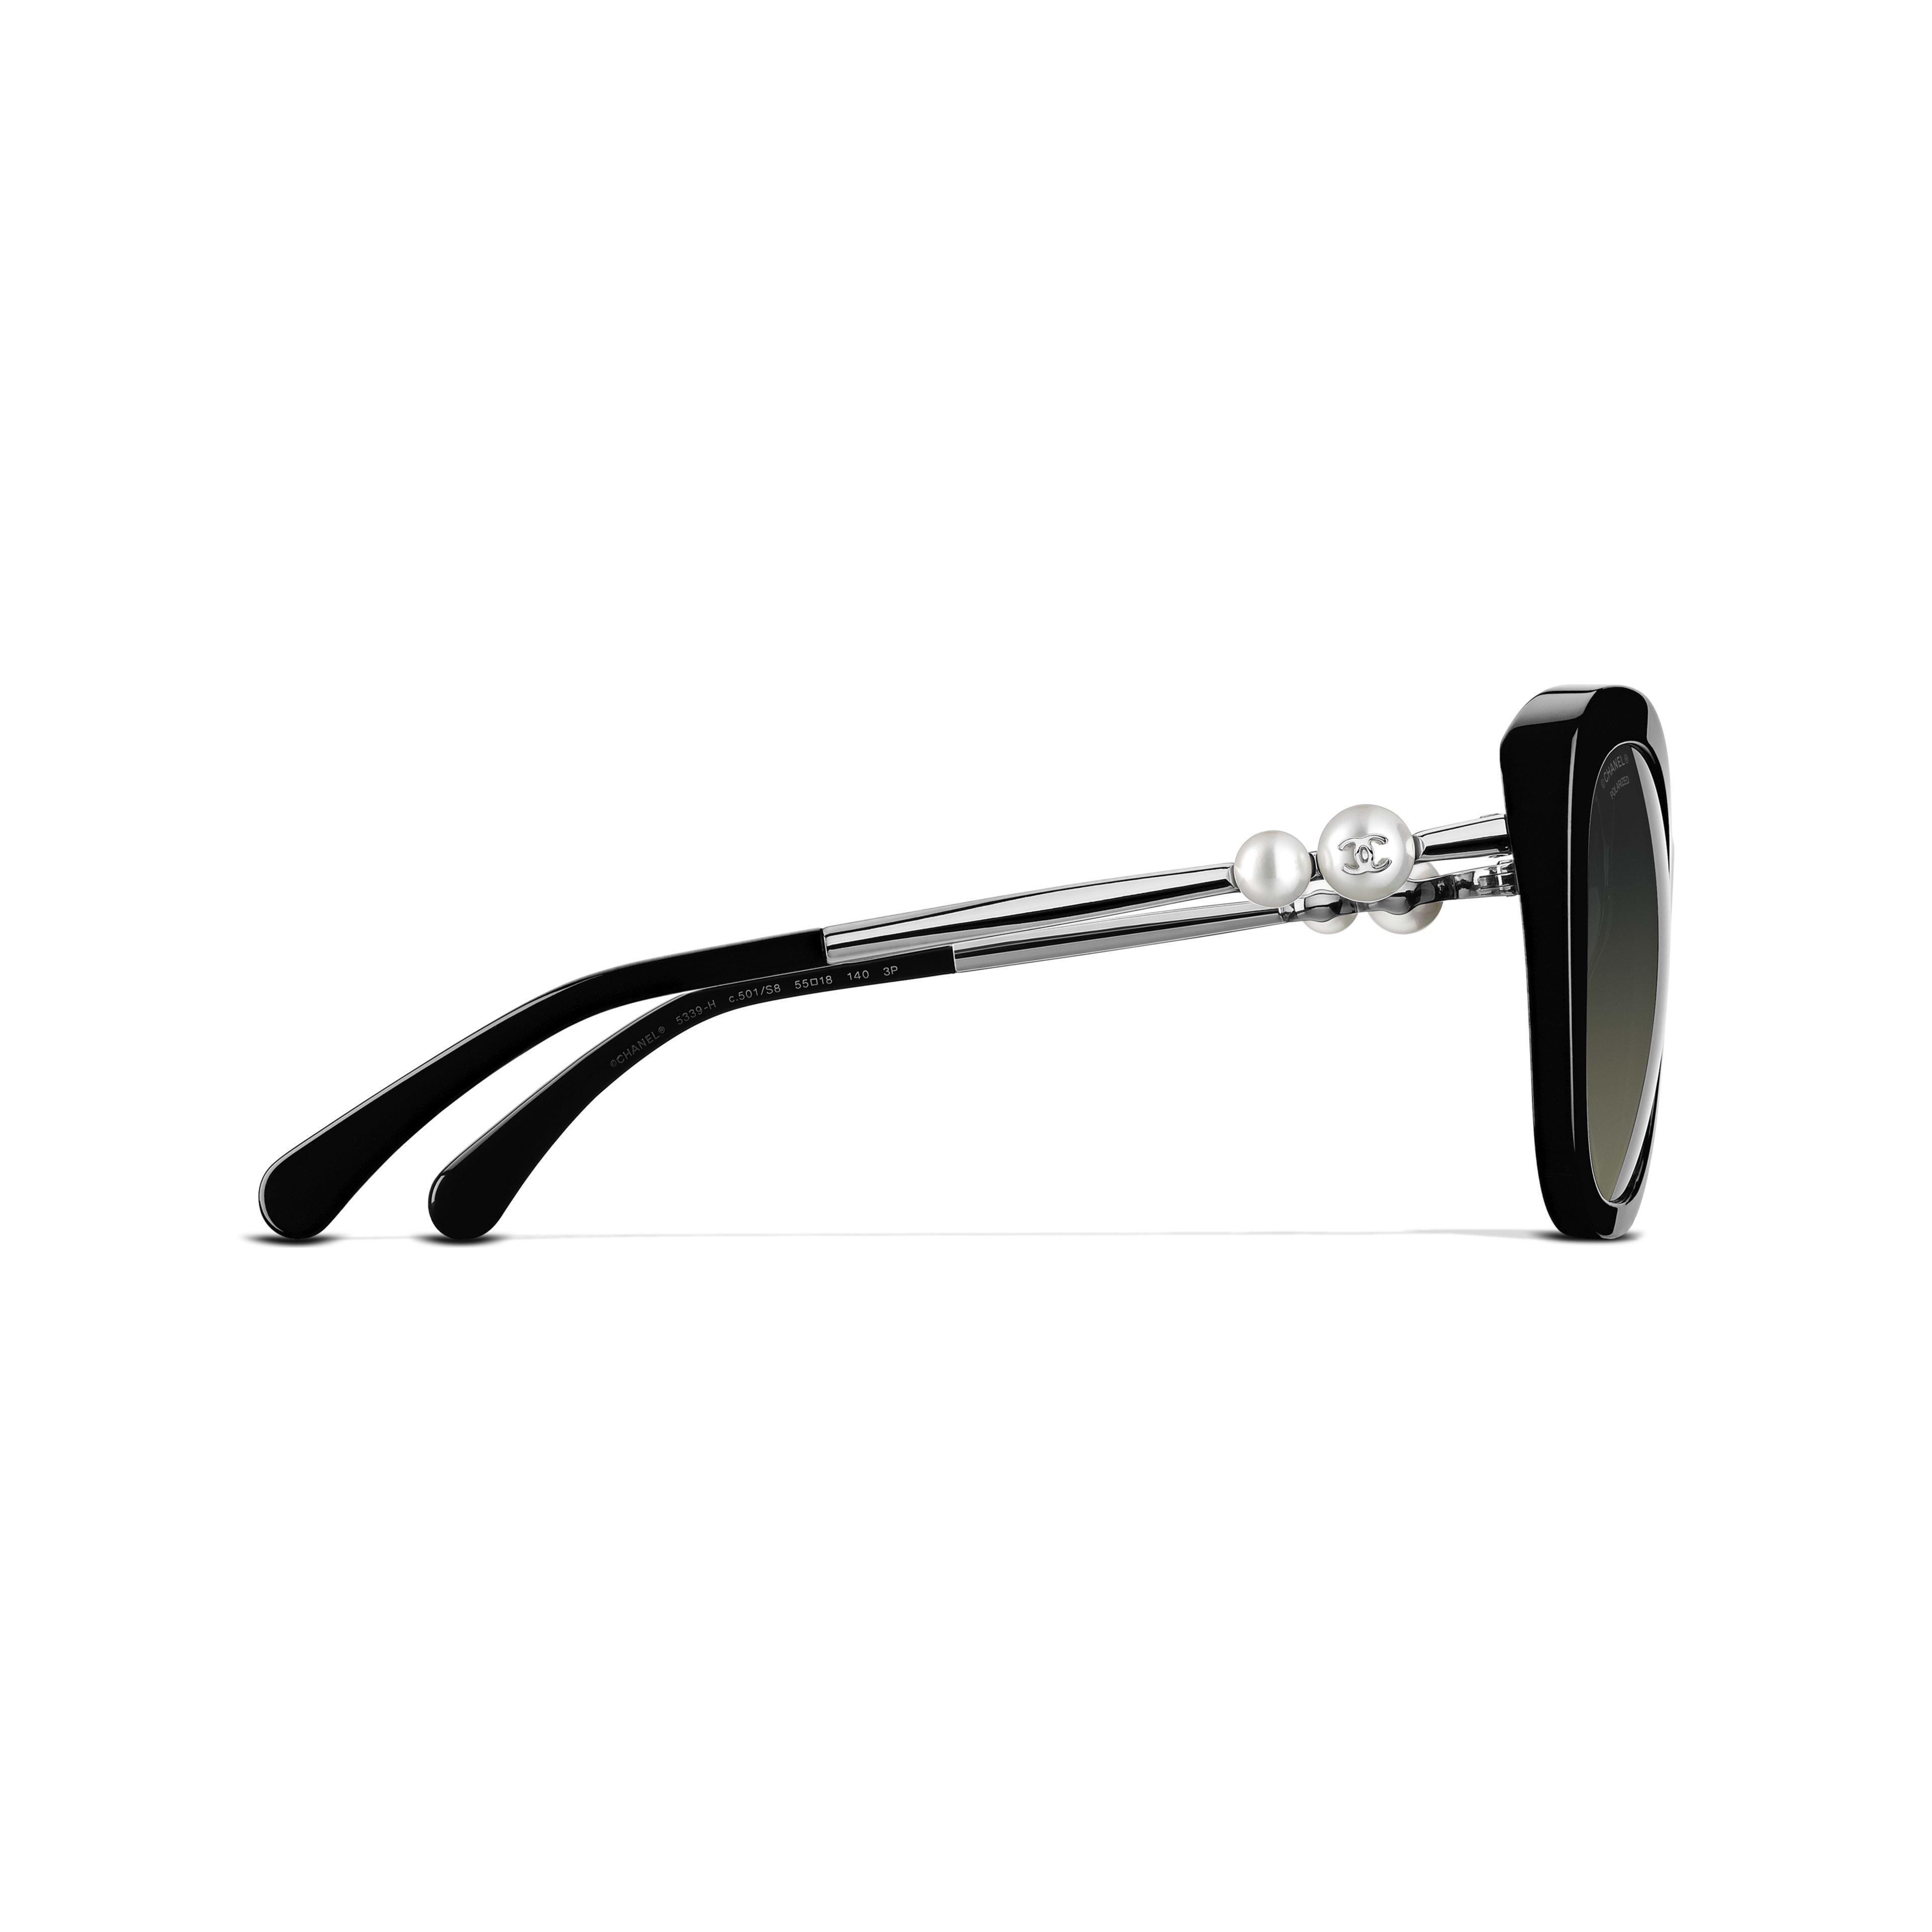 Square Sunglasses Acetate & Imitation Pearls - Polarized Lenses Black -                                                         view 3 - see full sized version